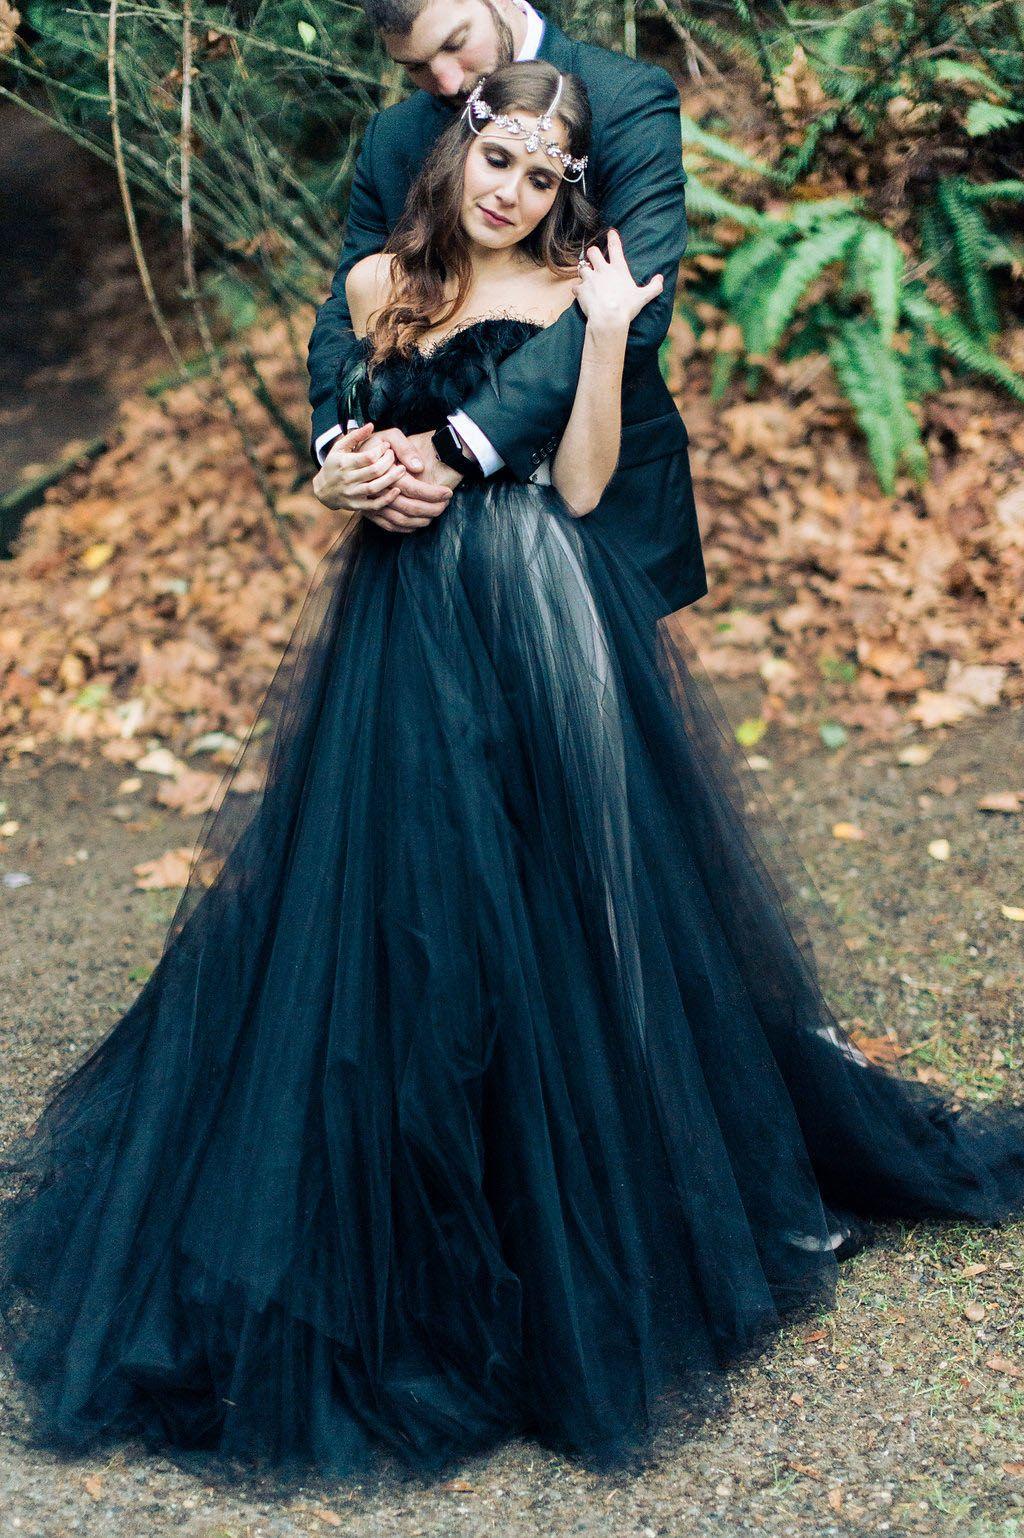 Woodland Nymph In A Black Wedding Dress Black Wedding Dresses Black Wedding Gowns Black Wedding [ 1538 x 1024 Pixel ]